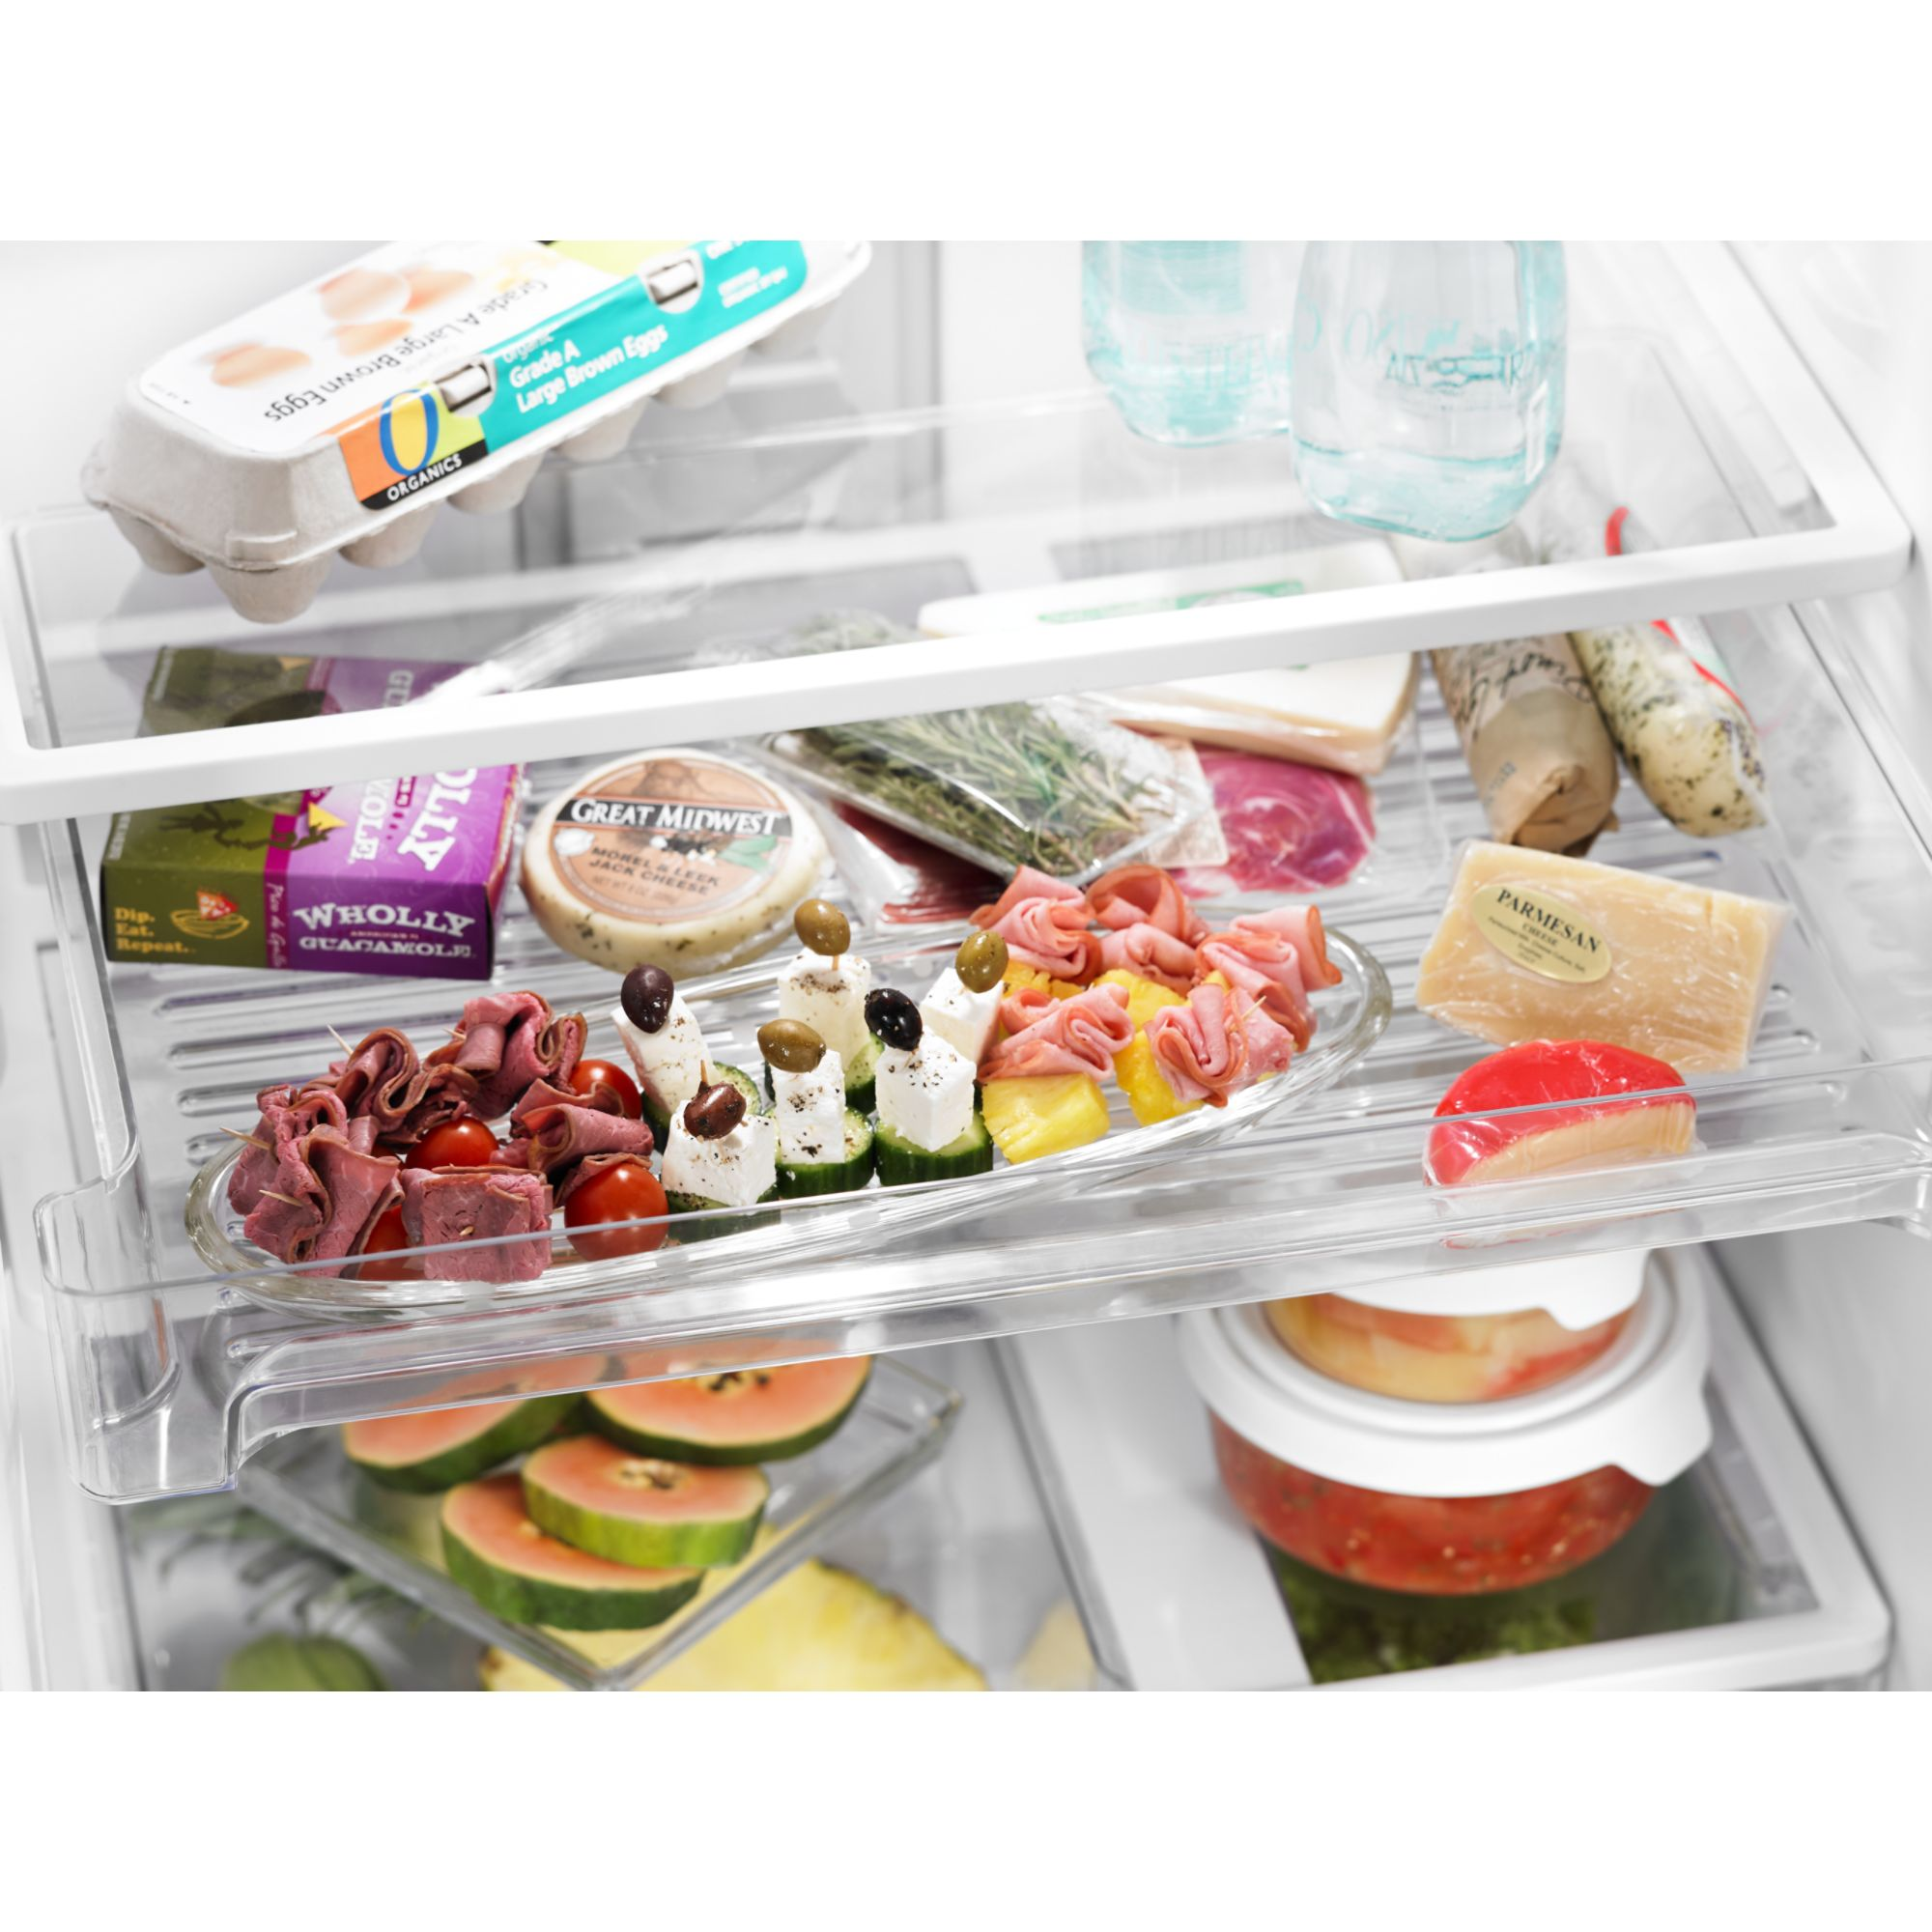 Whirlpool 21.1 cu. ft. Top-freezer Refrigerator w/ CEE Tier 3 Rating - White